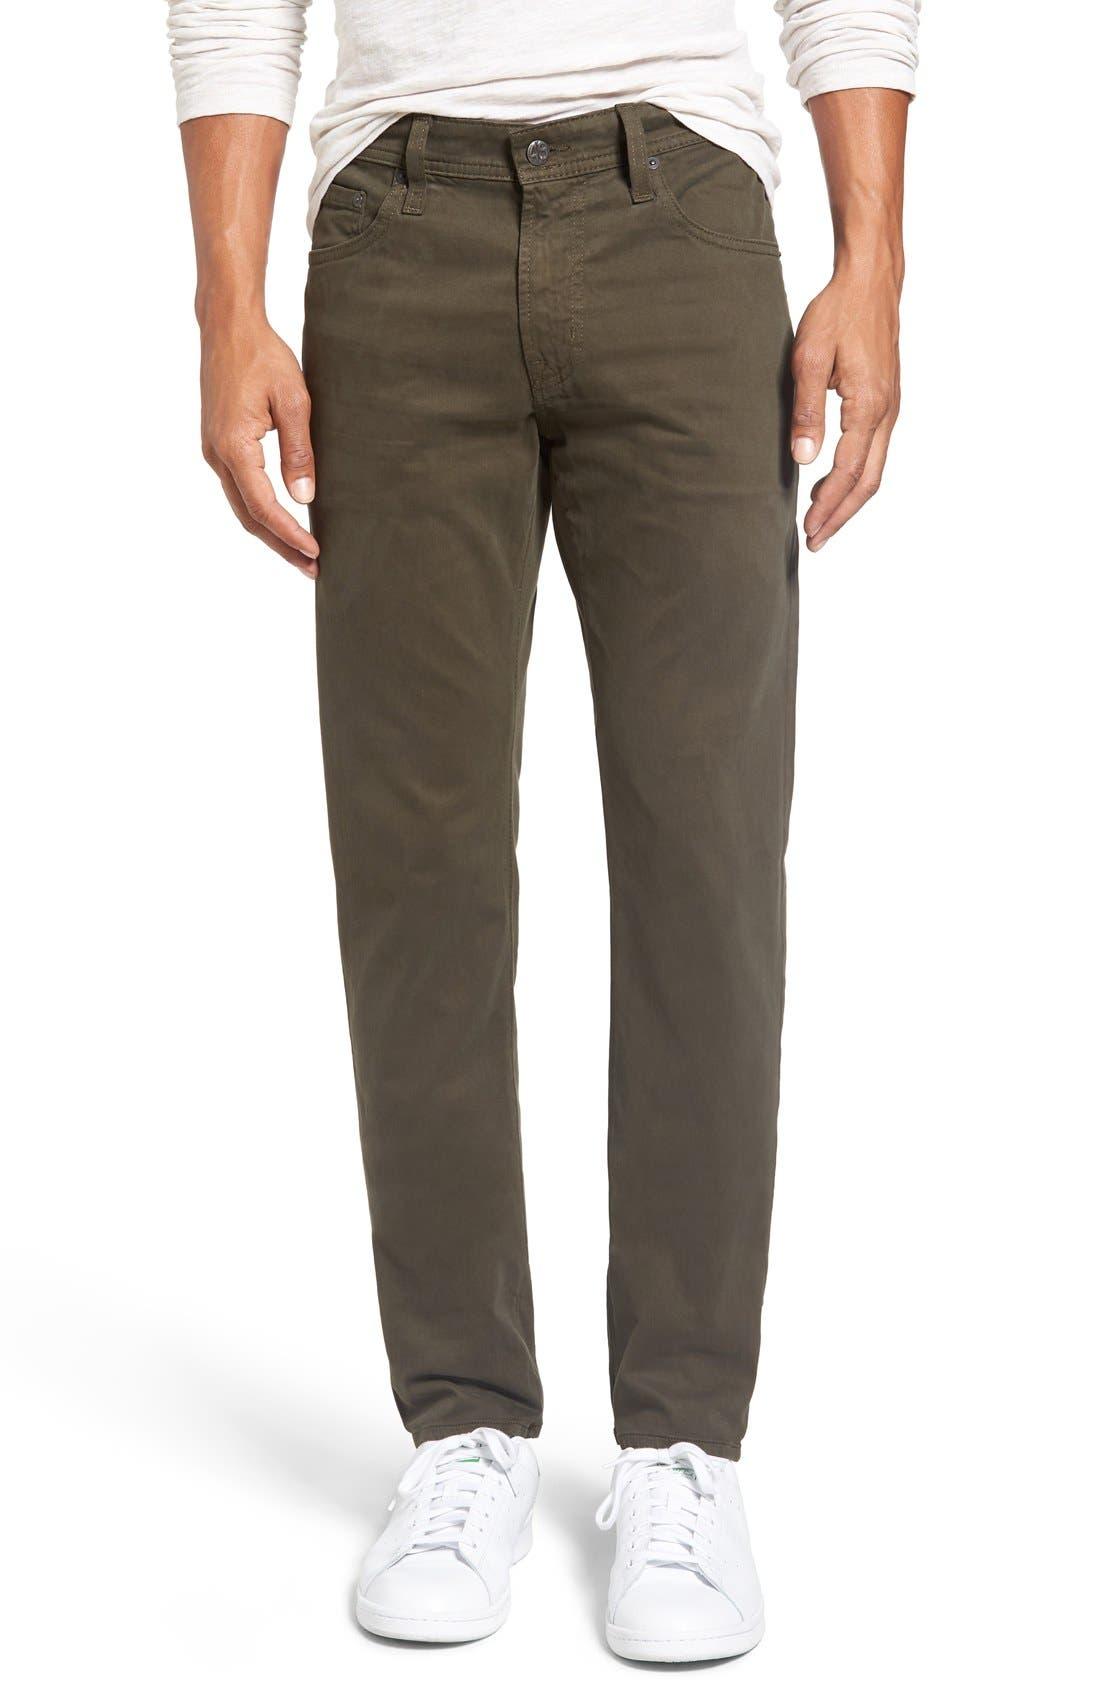 Alternate Image 1 Selected - AG Dylan Slim Fit Pants